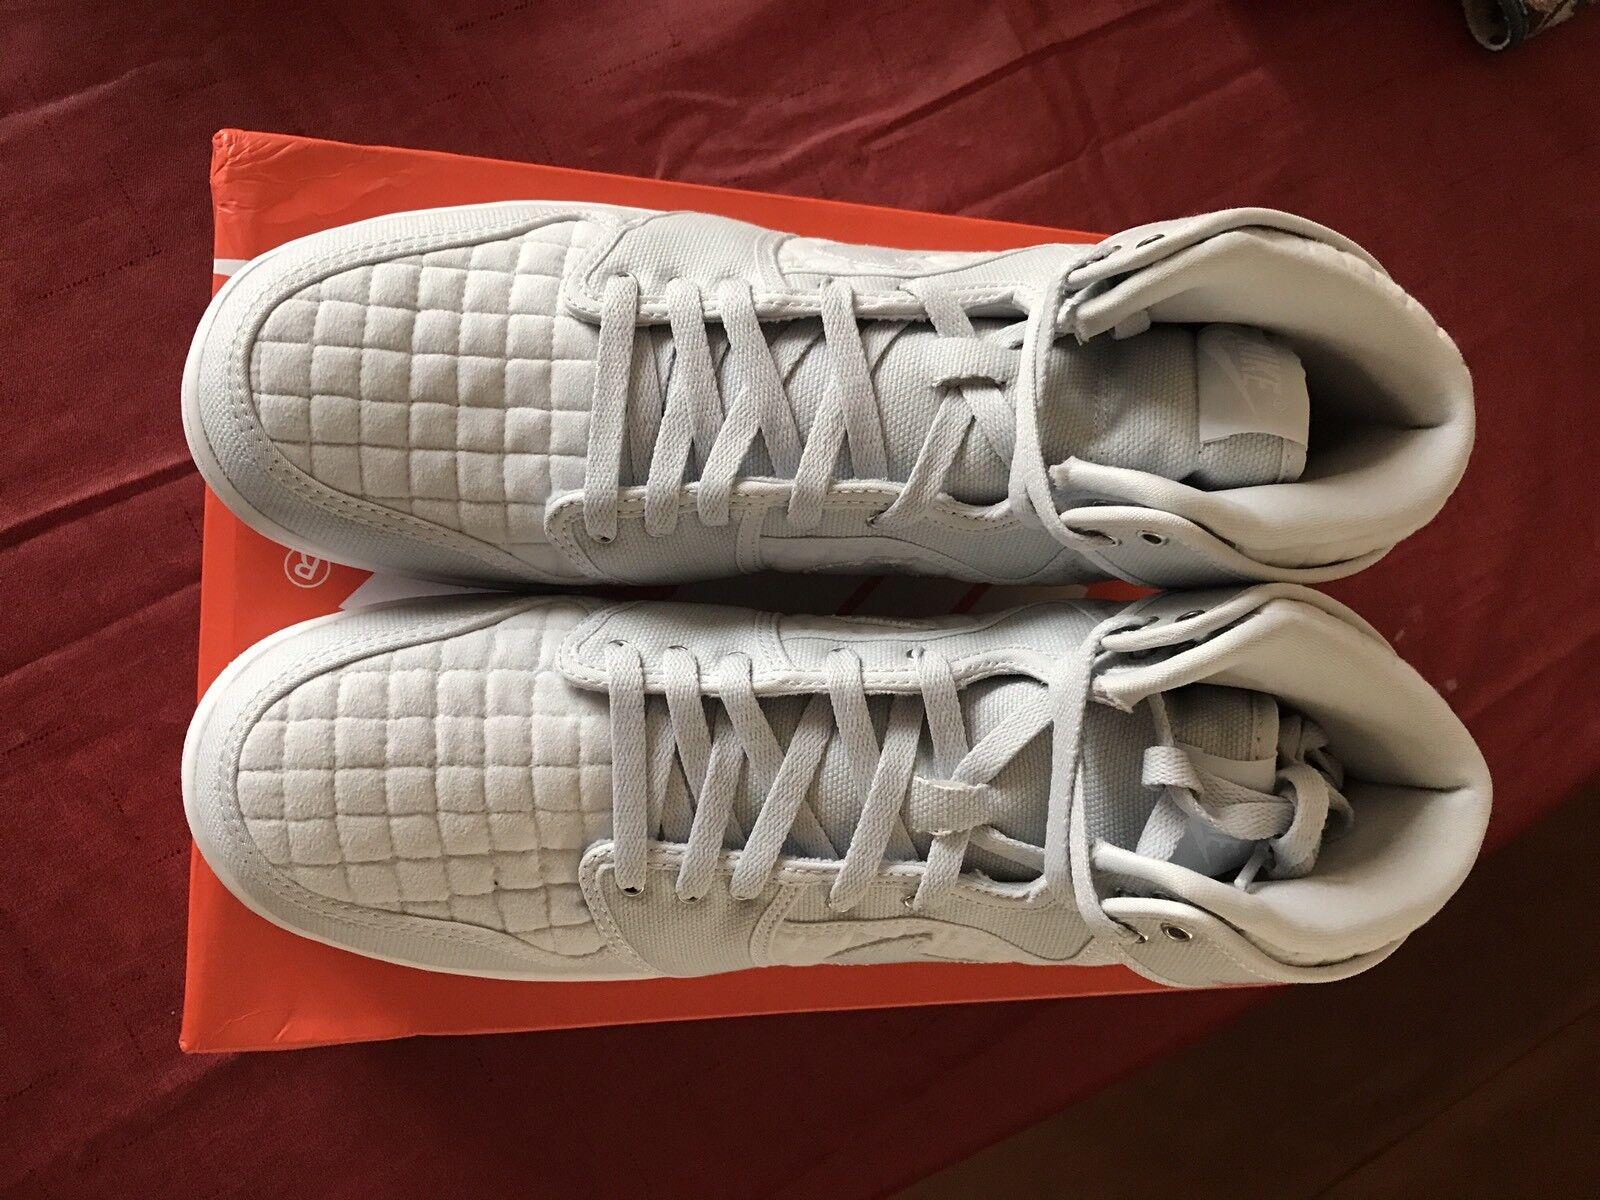 Nike uomini aji ko alto 13 og scarpe taglia 13 alto ac211a